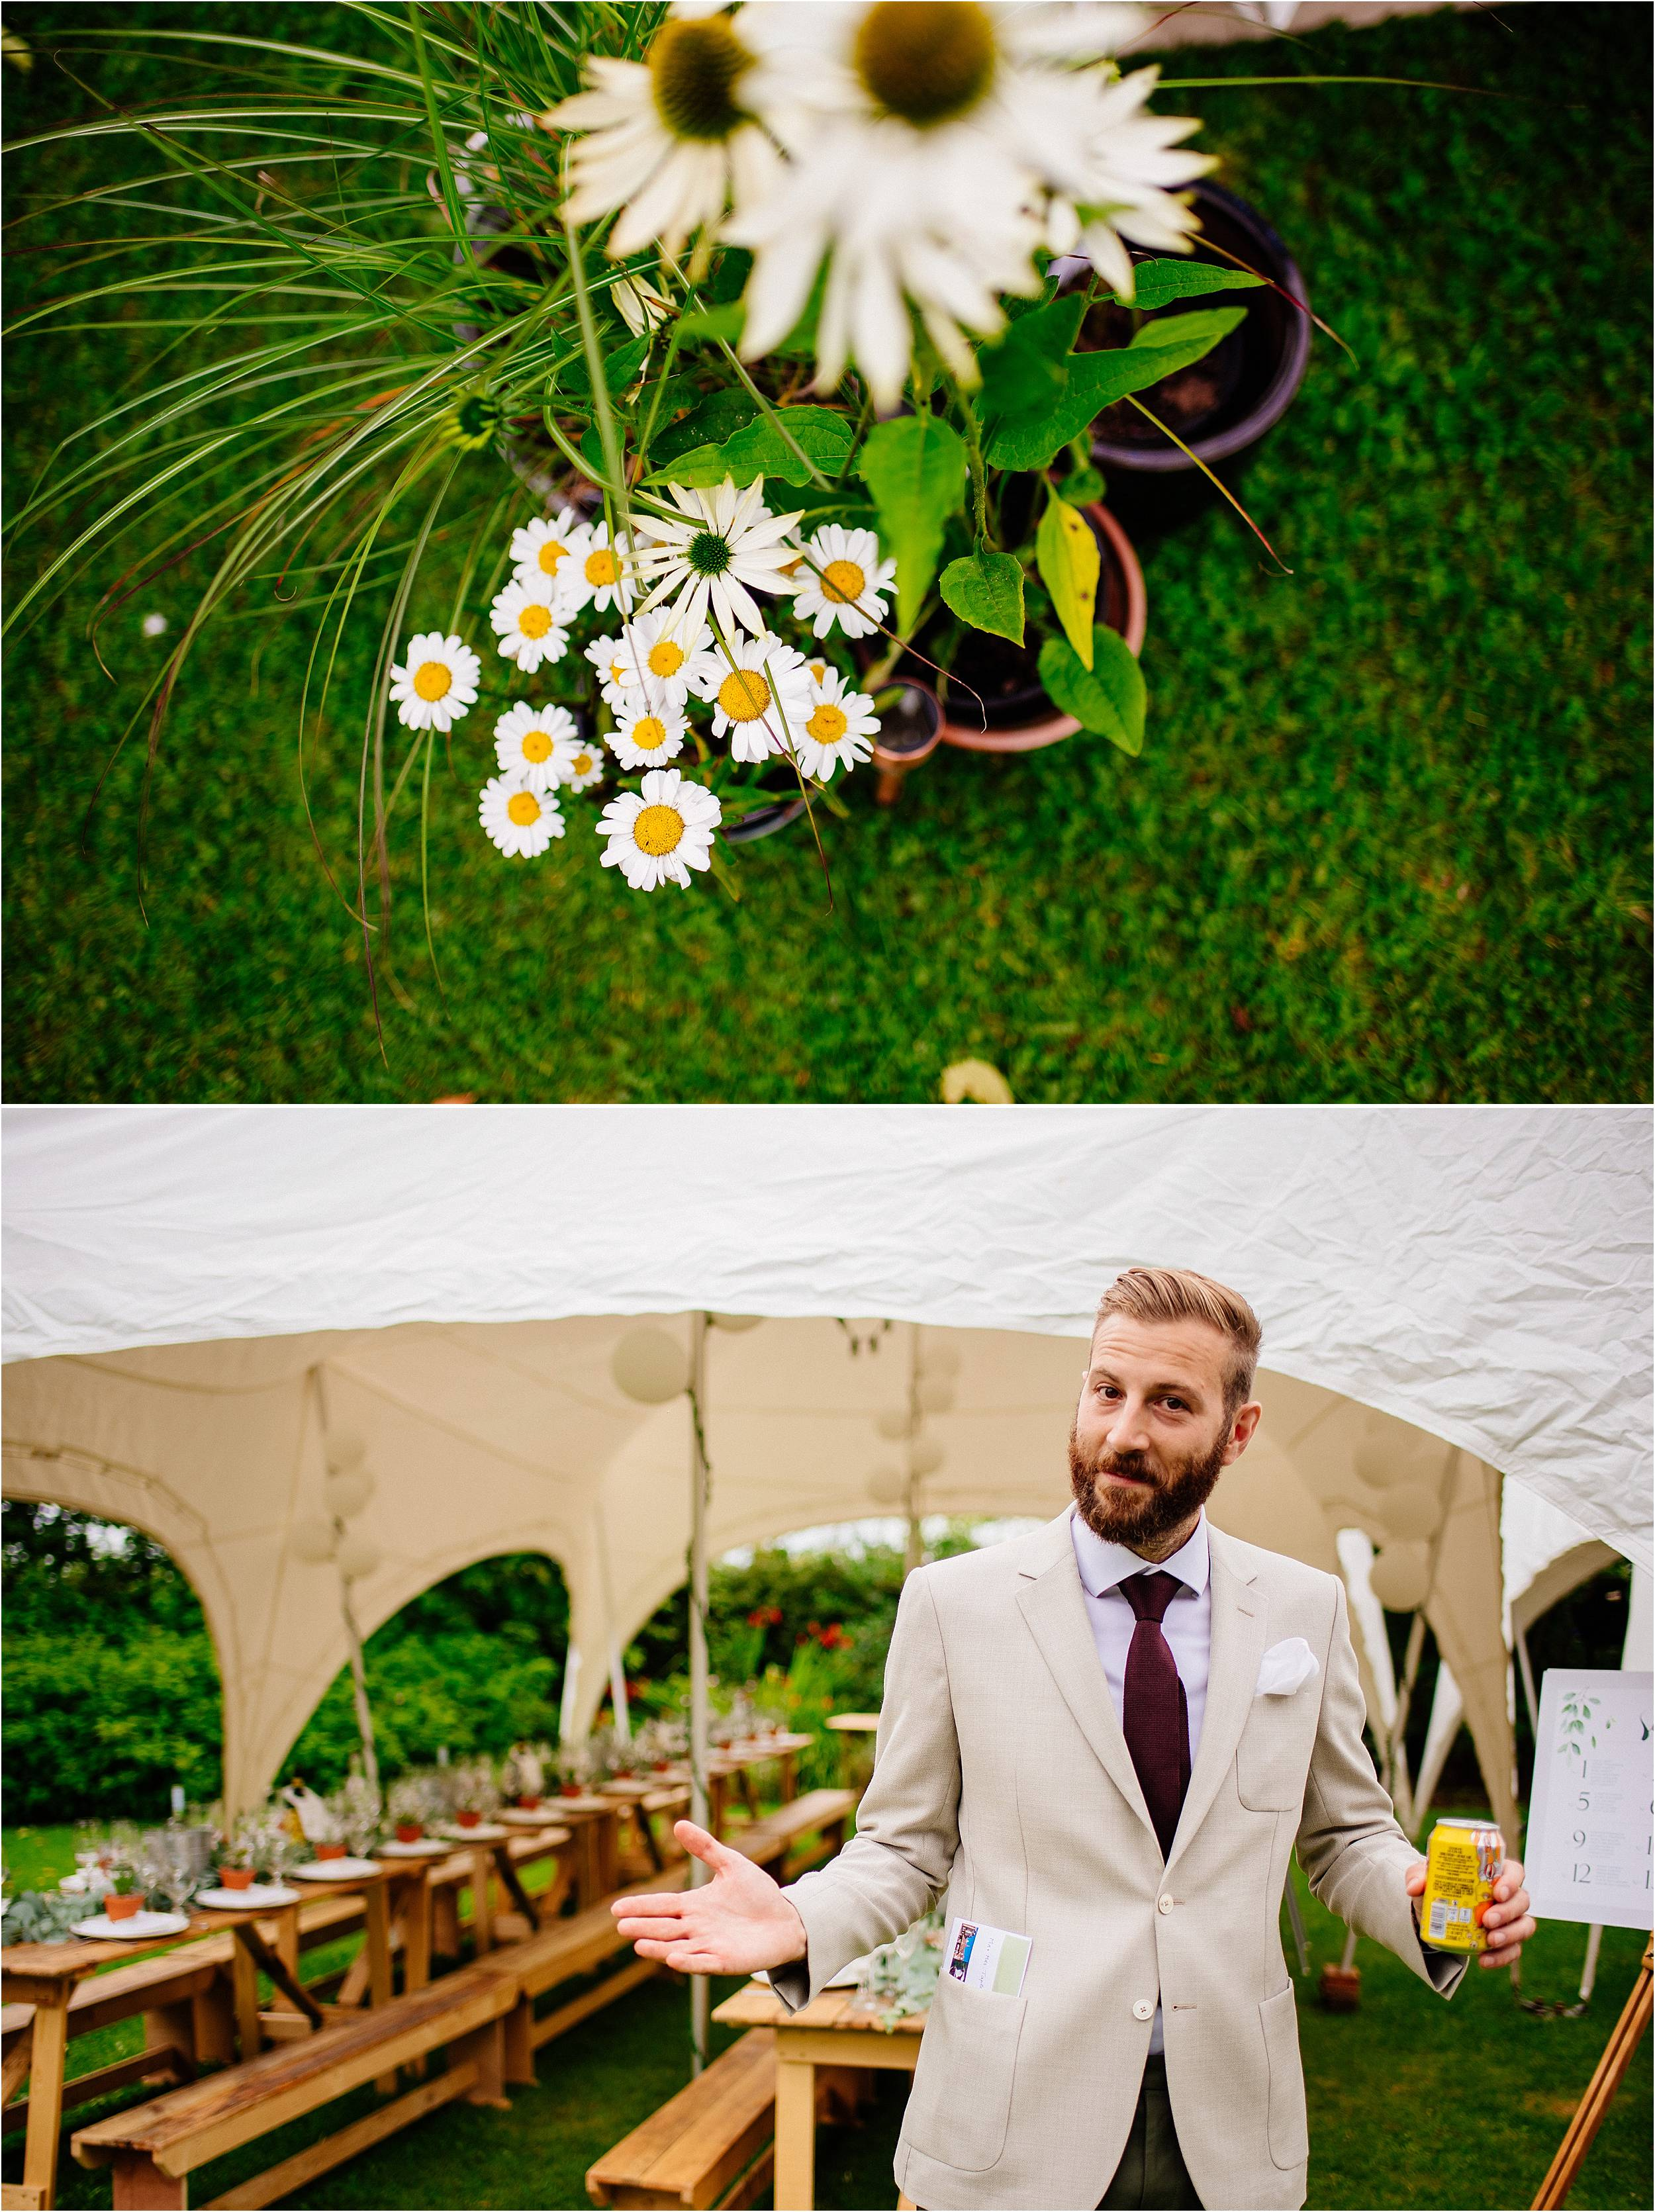 Barnsdale Gardens Wedding Photographer_0047.jpg